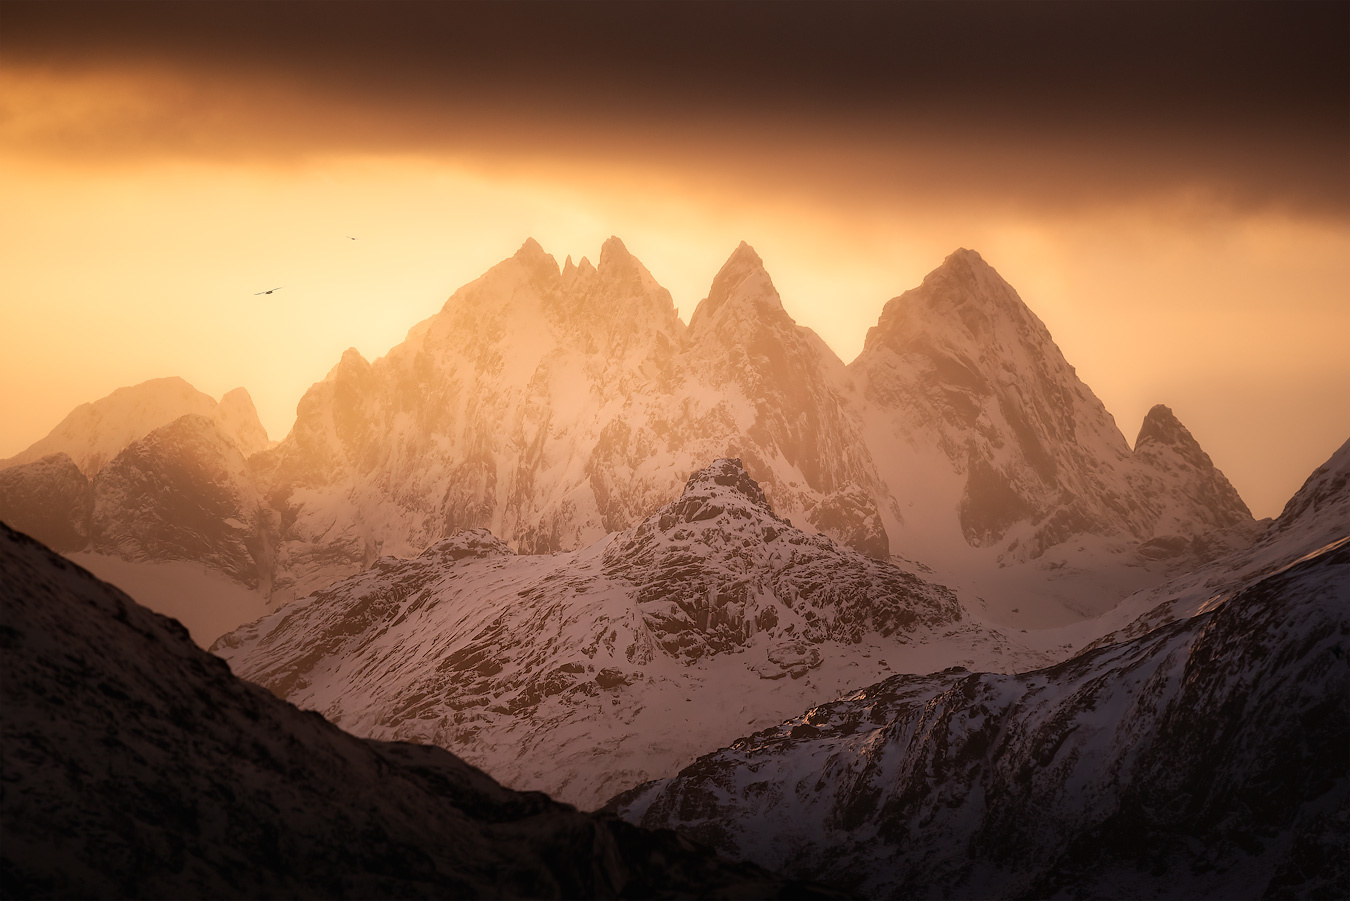 ''Lofoten Gold'' by Kevin Teerlynck